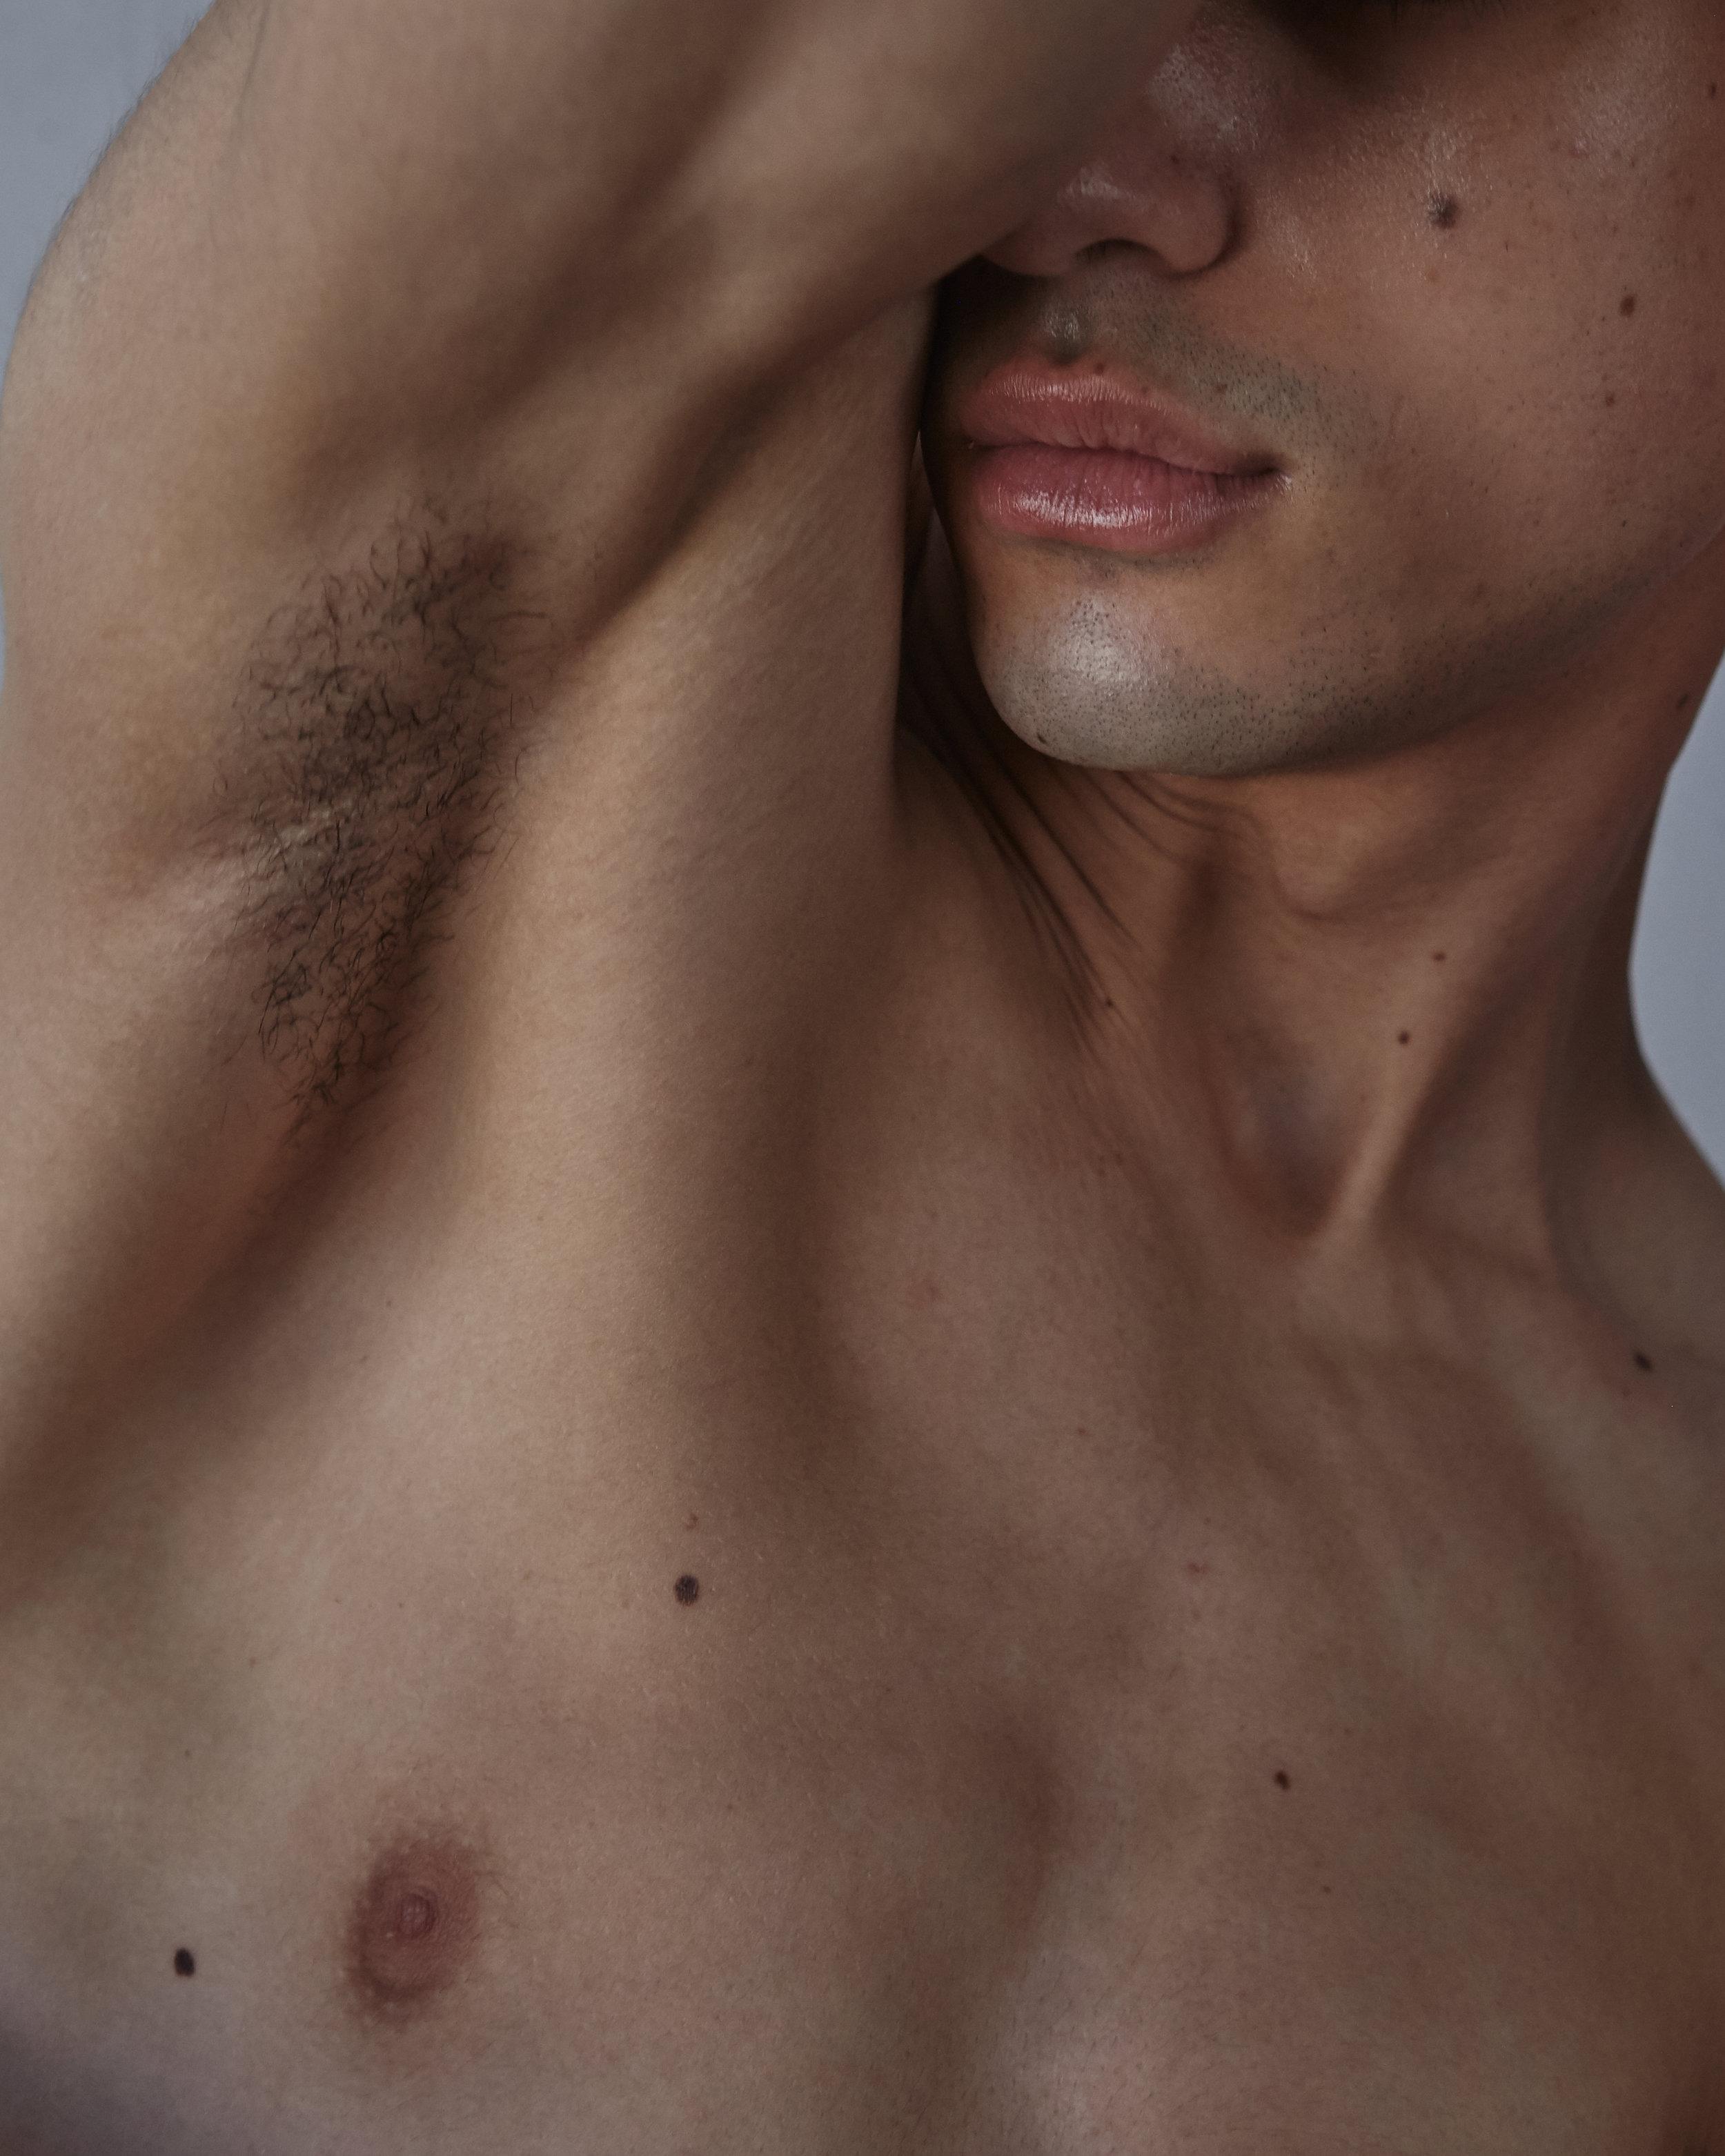 undressed_005.jpg